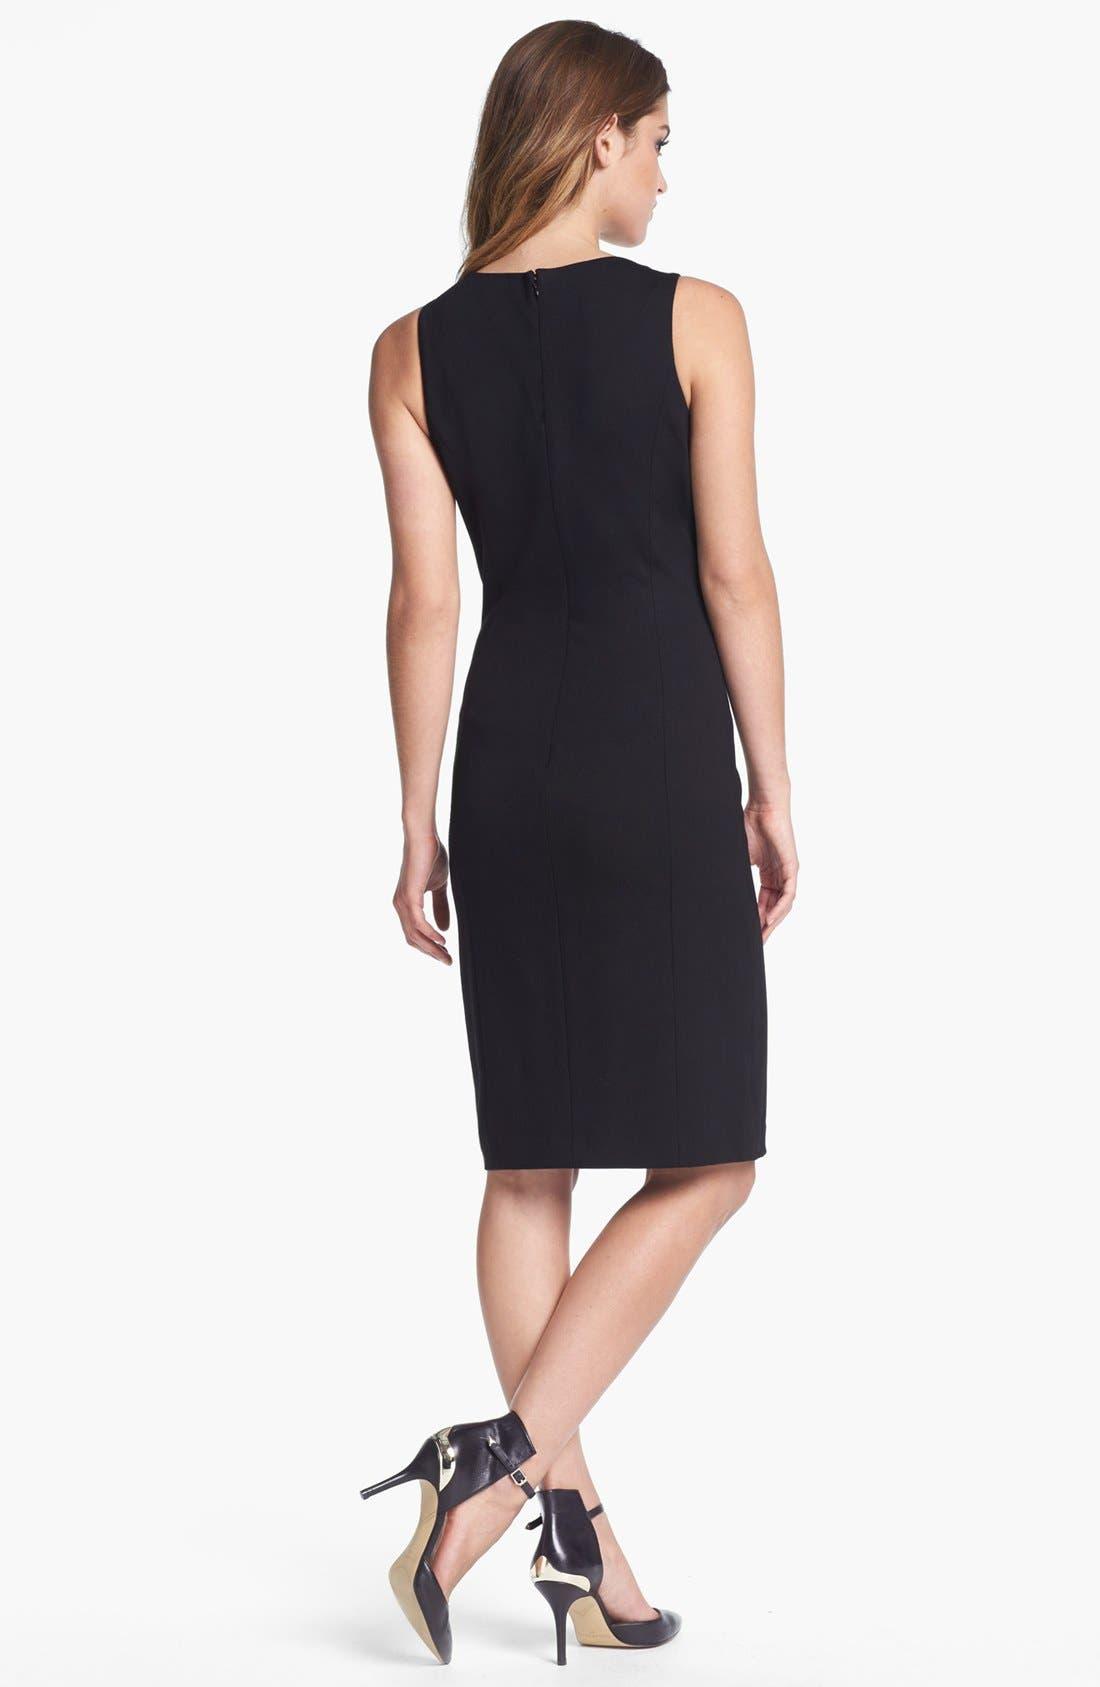 Alternate Image 2  - Vince Camuto Colorblock V-Neck Sheath Dress (Regular & Petite) (Nordstrom Exclusive)